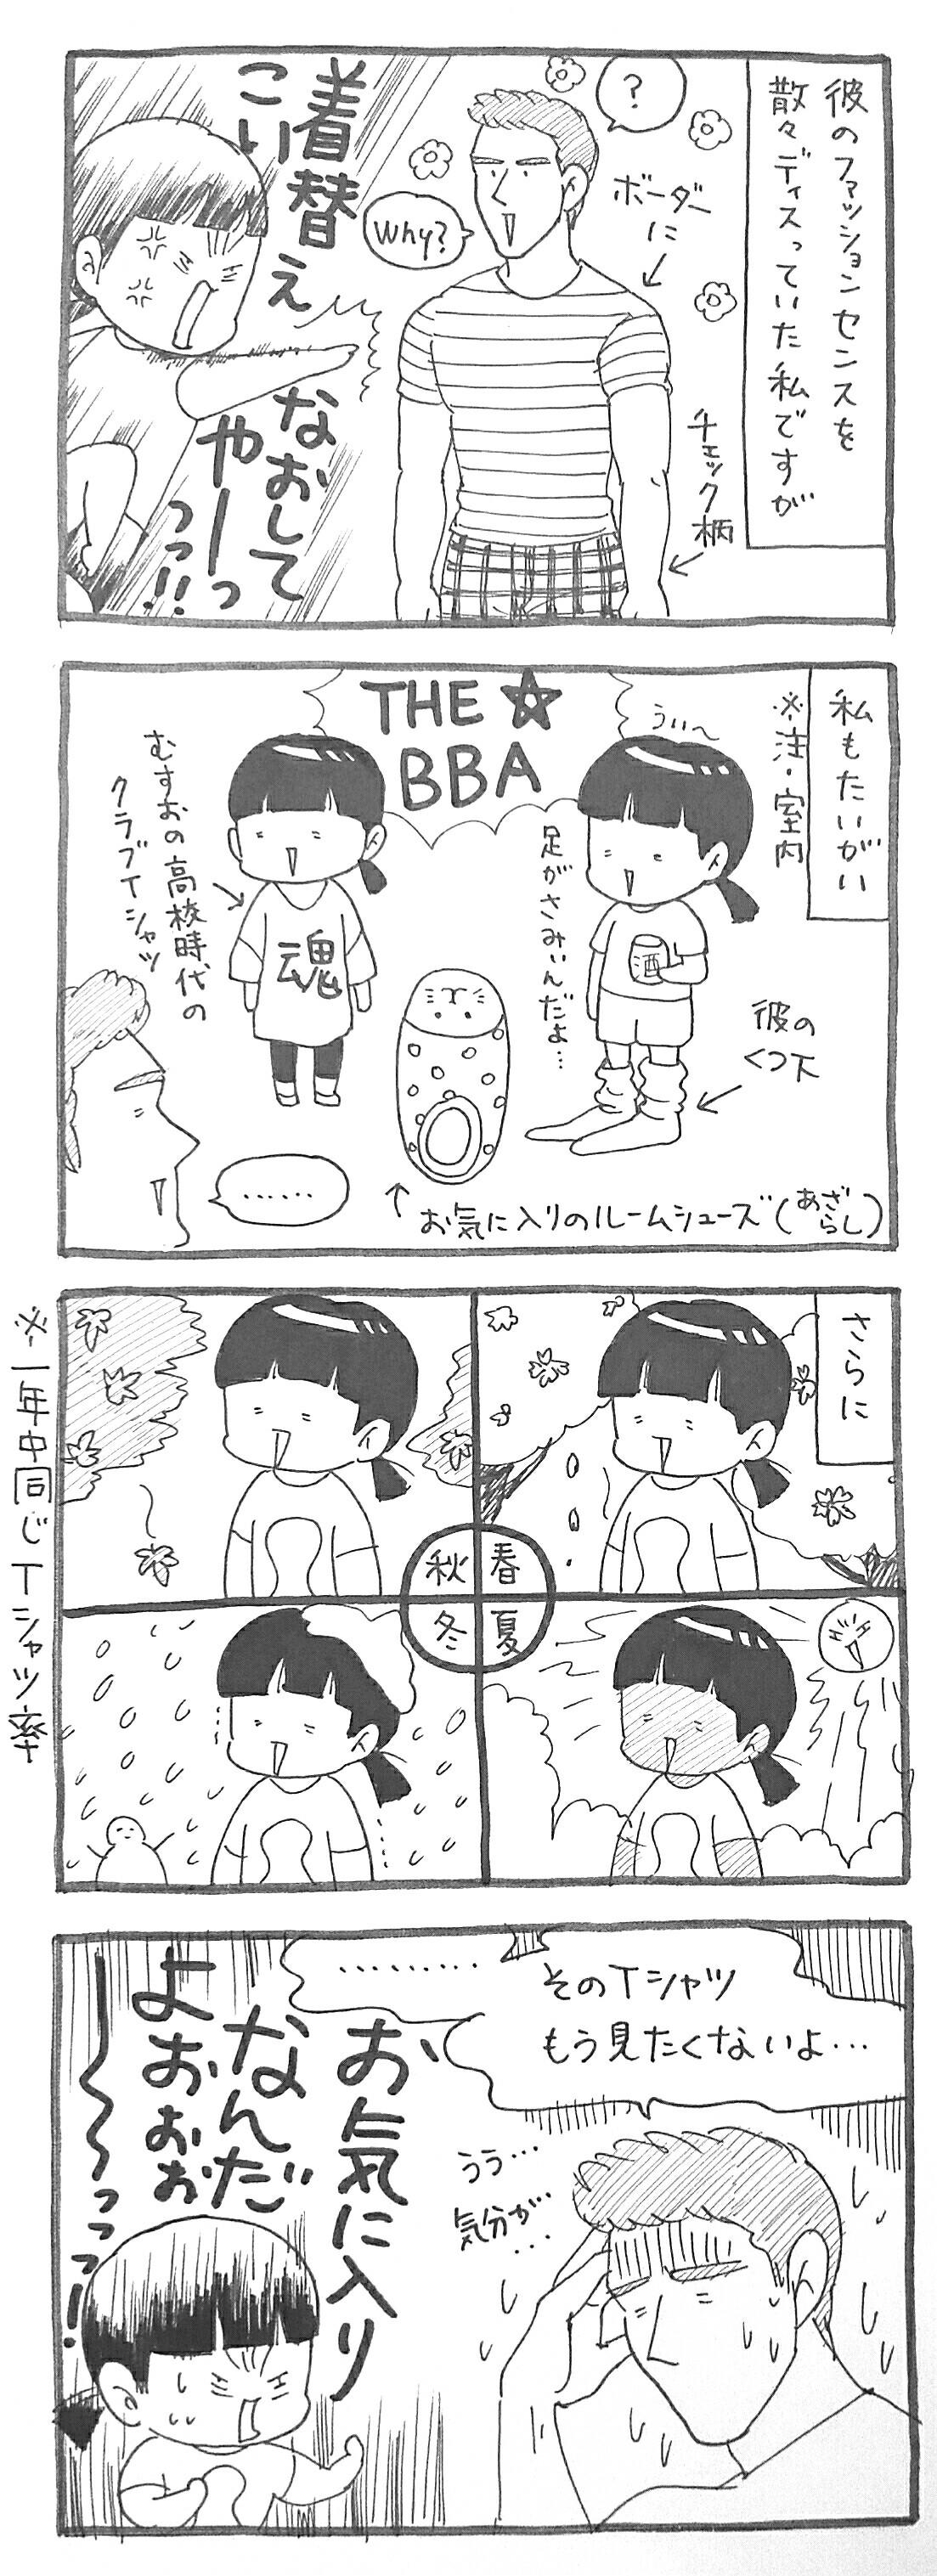 f:id:Shoko_drawing:20190824102833j:plain